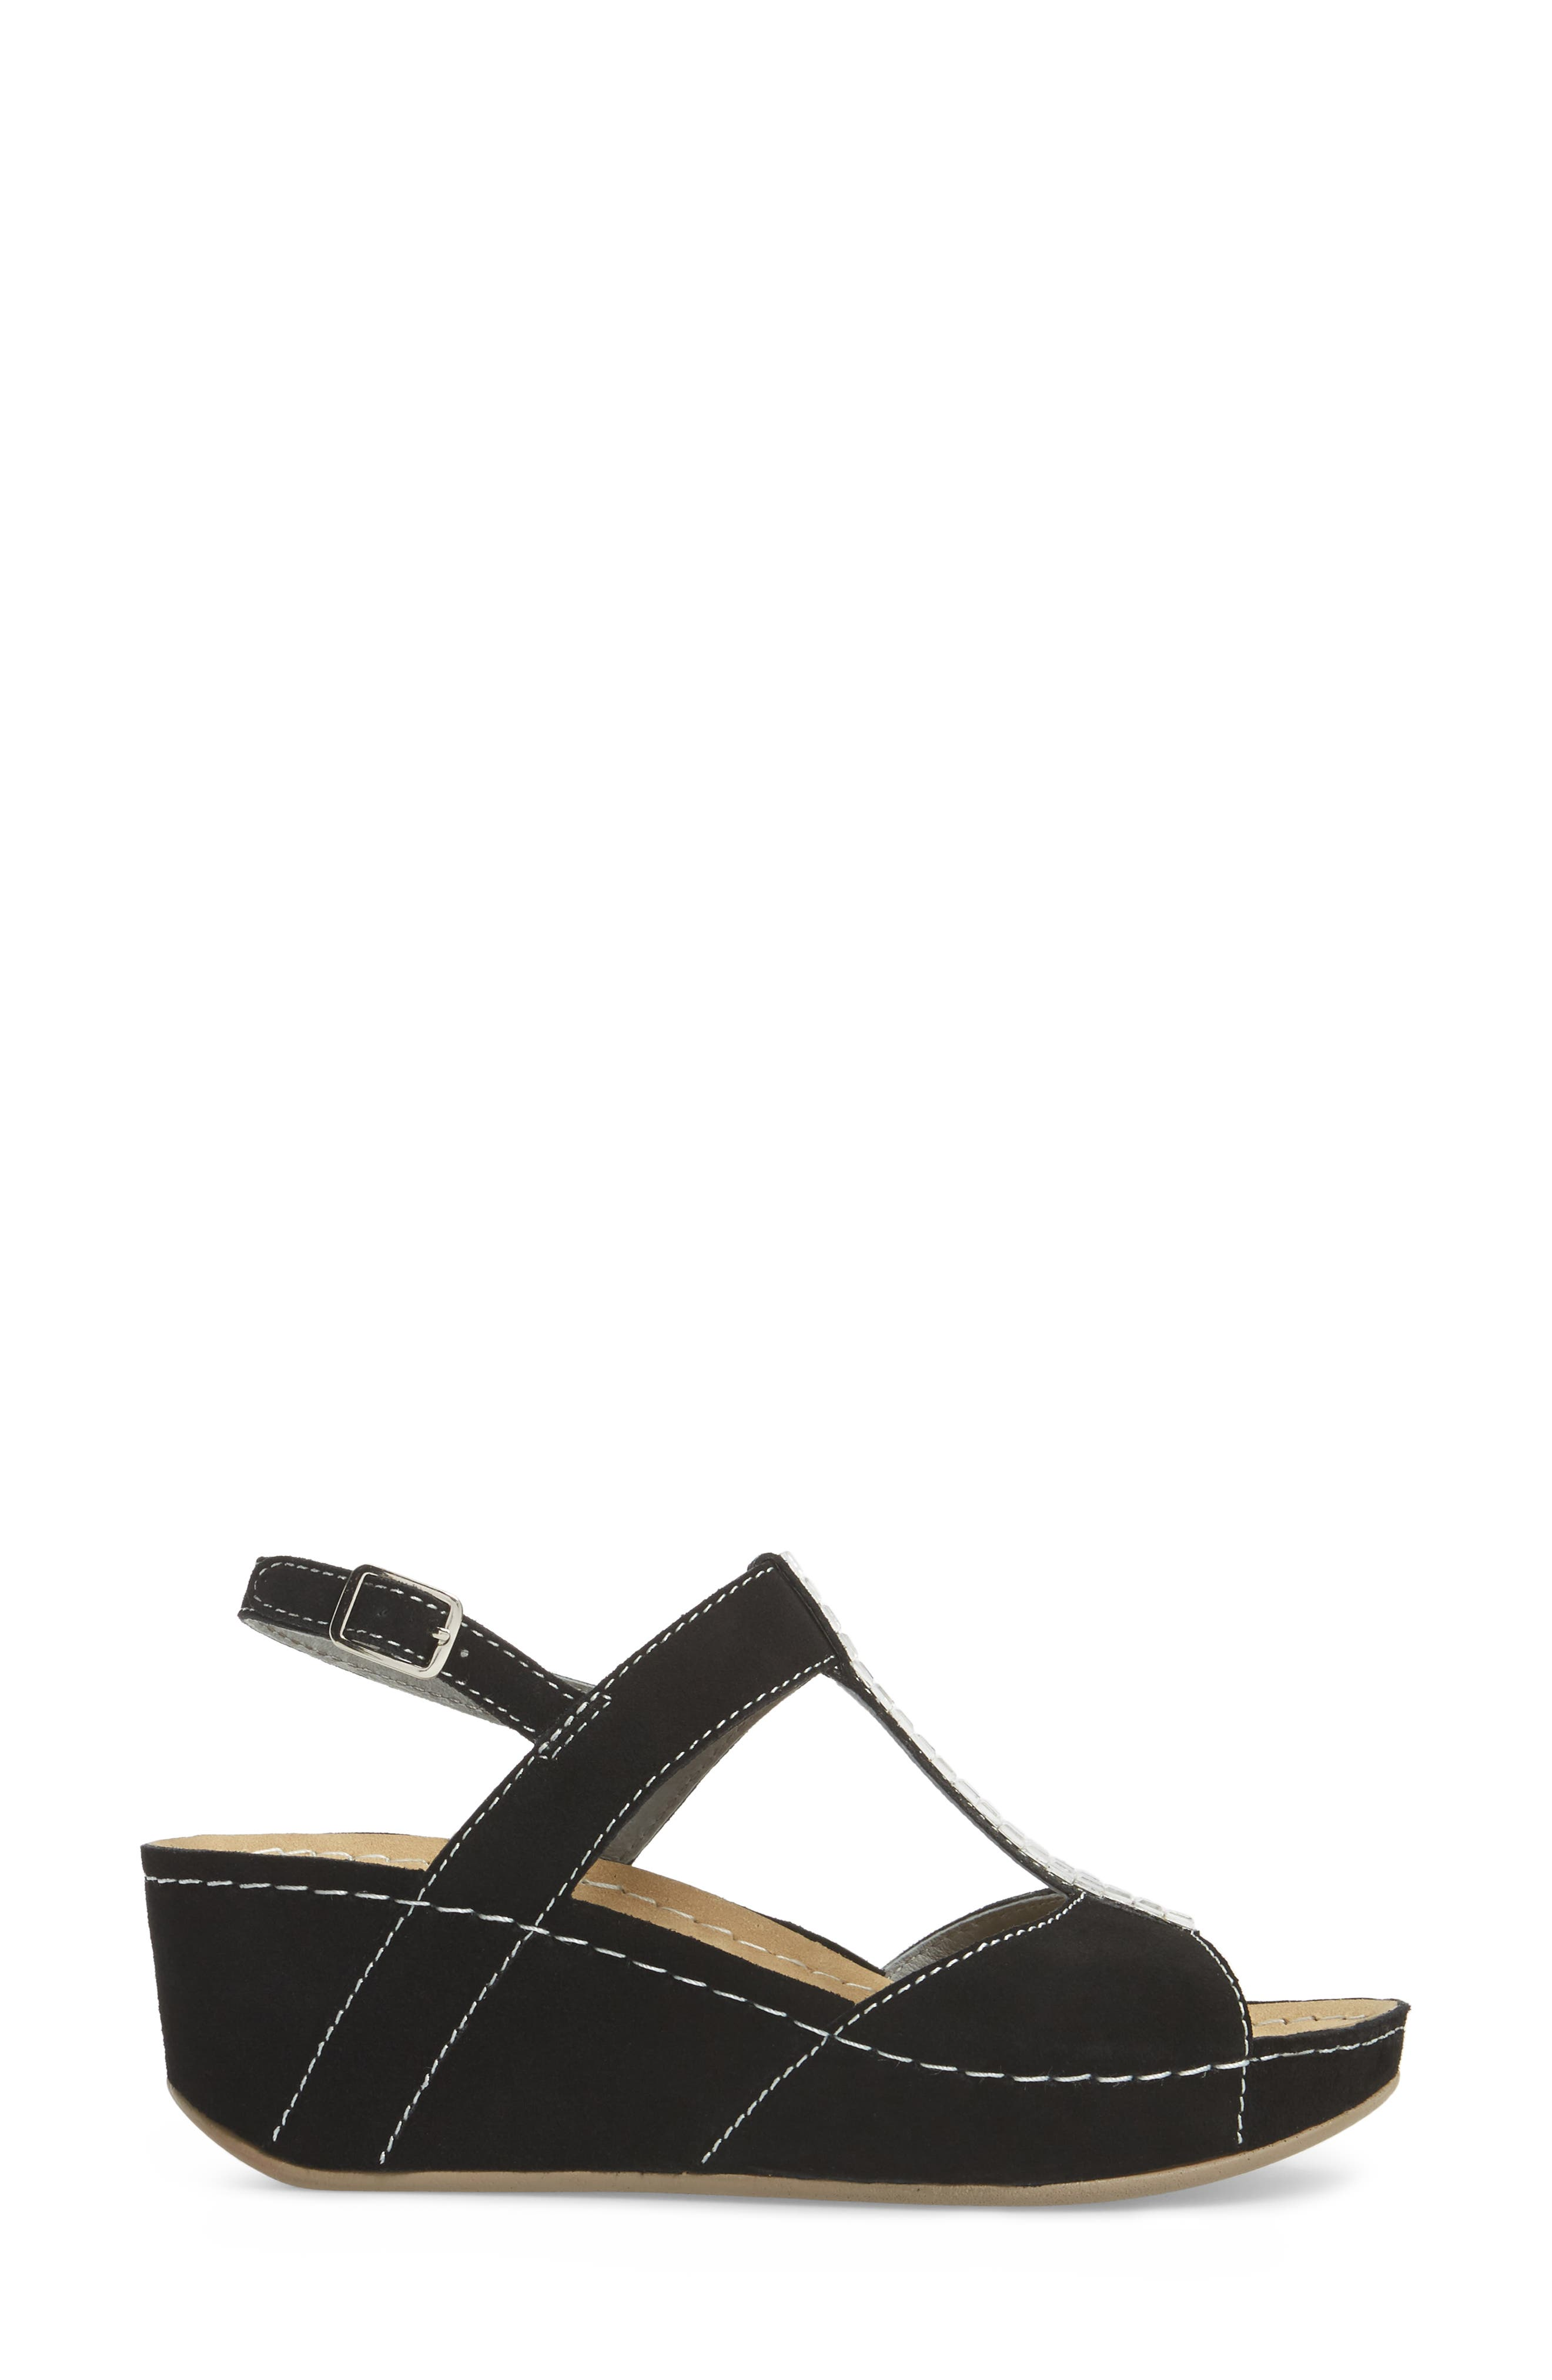 ,                             Bubbly Embellished T-Strap Wedge Sandal,                             Alternate thumbnail 3, color,                             BLACK SUEDE